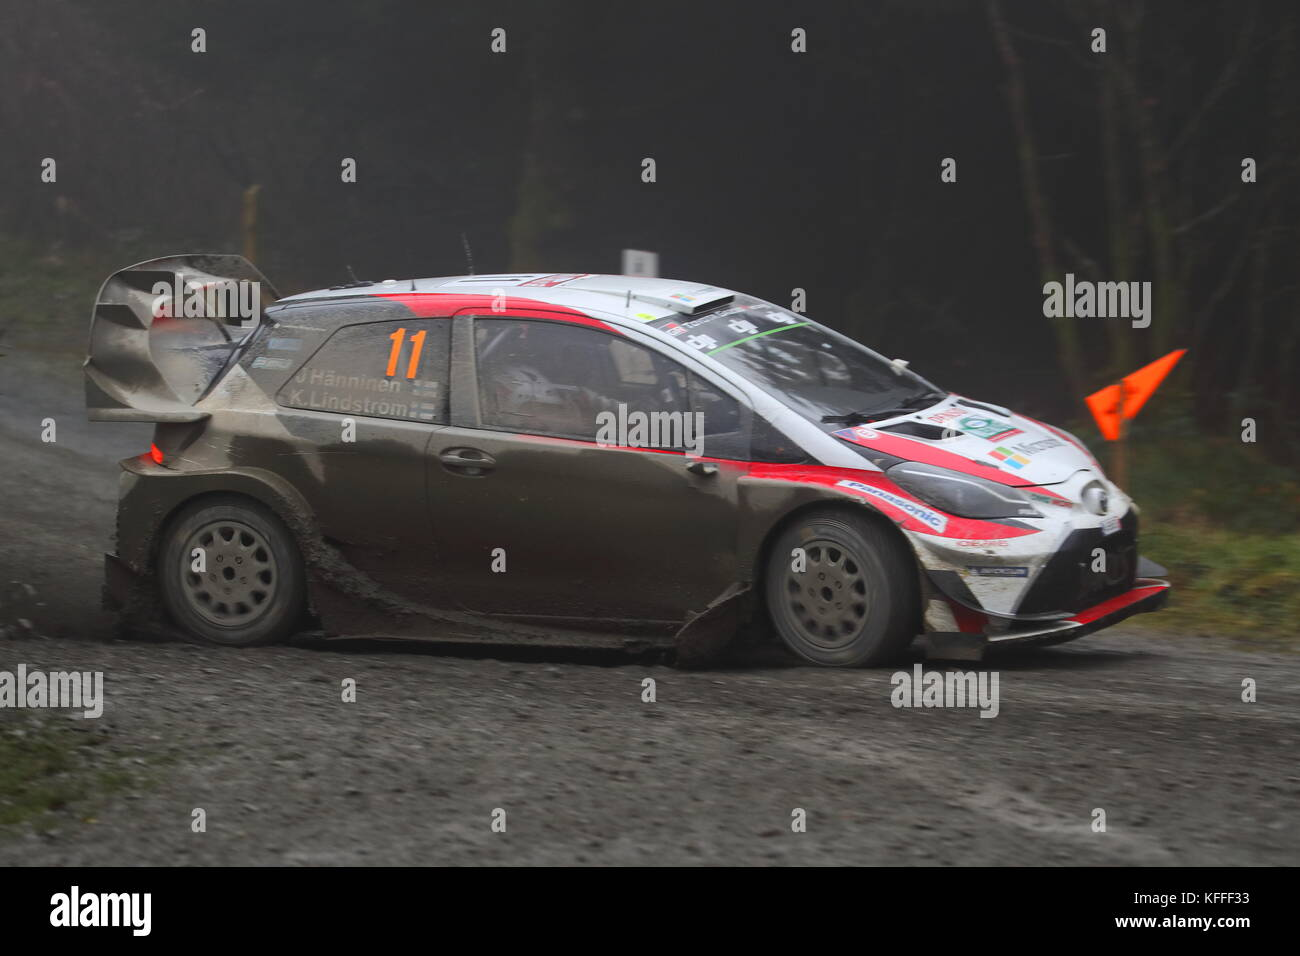 Toyota Rally Cars 2017 Stock Photos & Toyota Rally Cars 2017 Stock ...